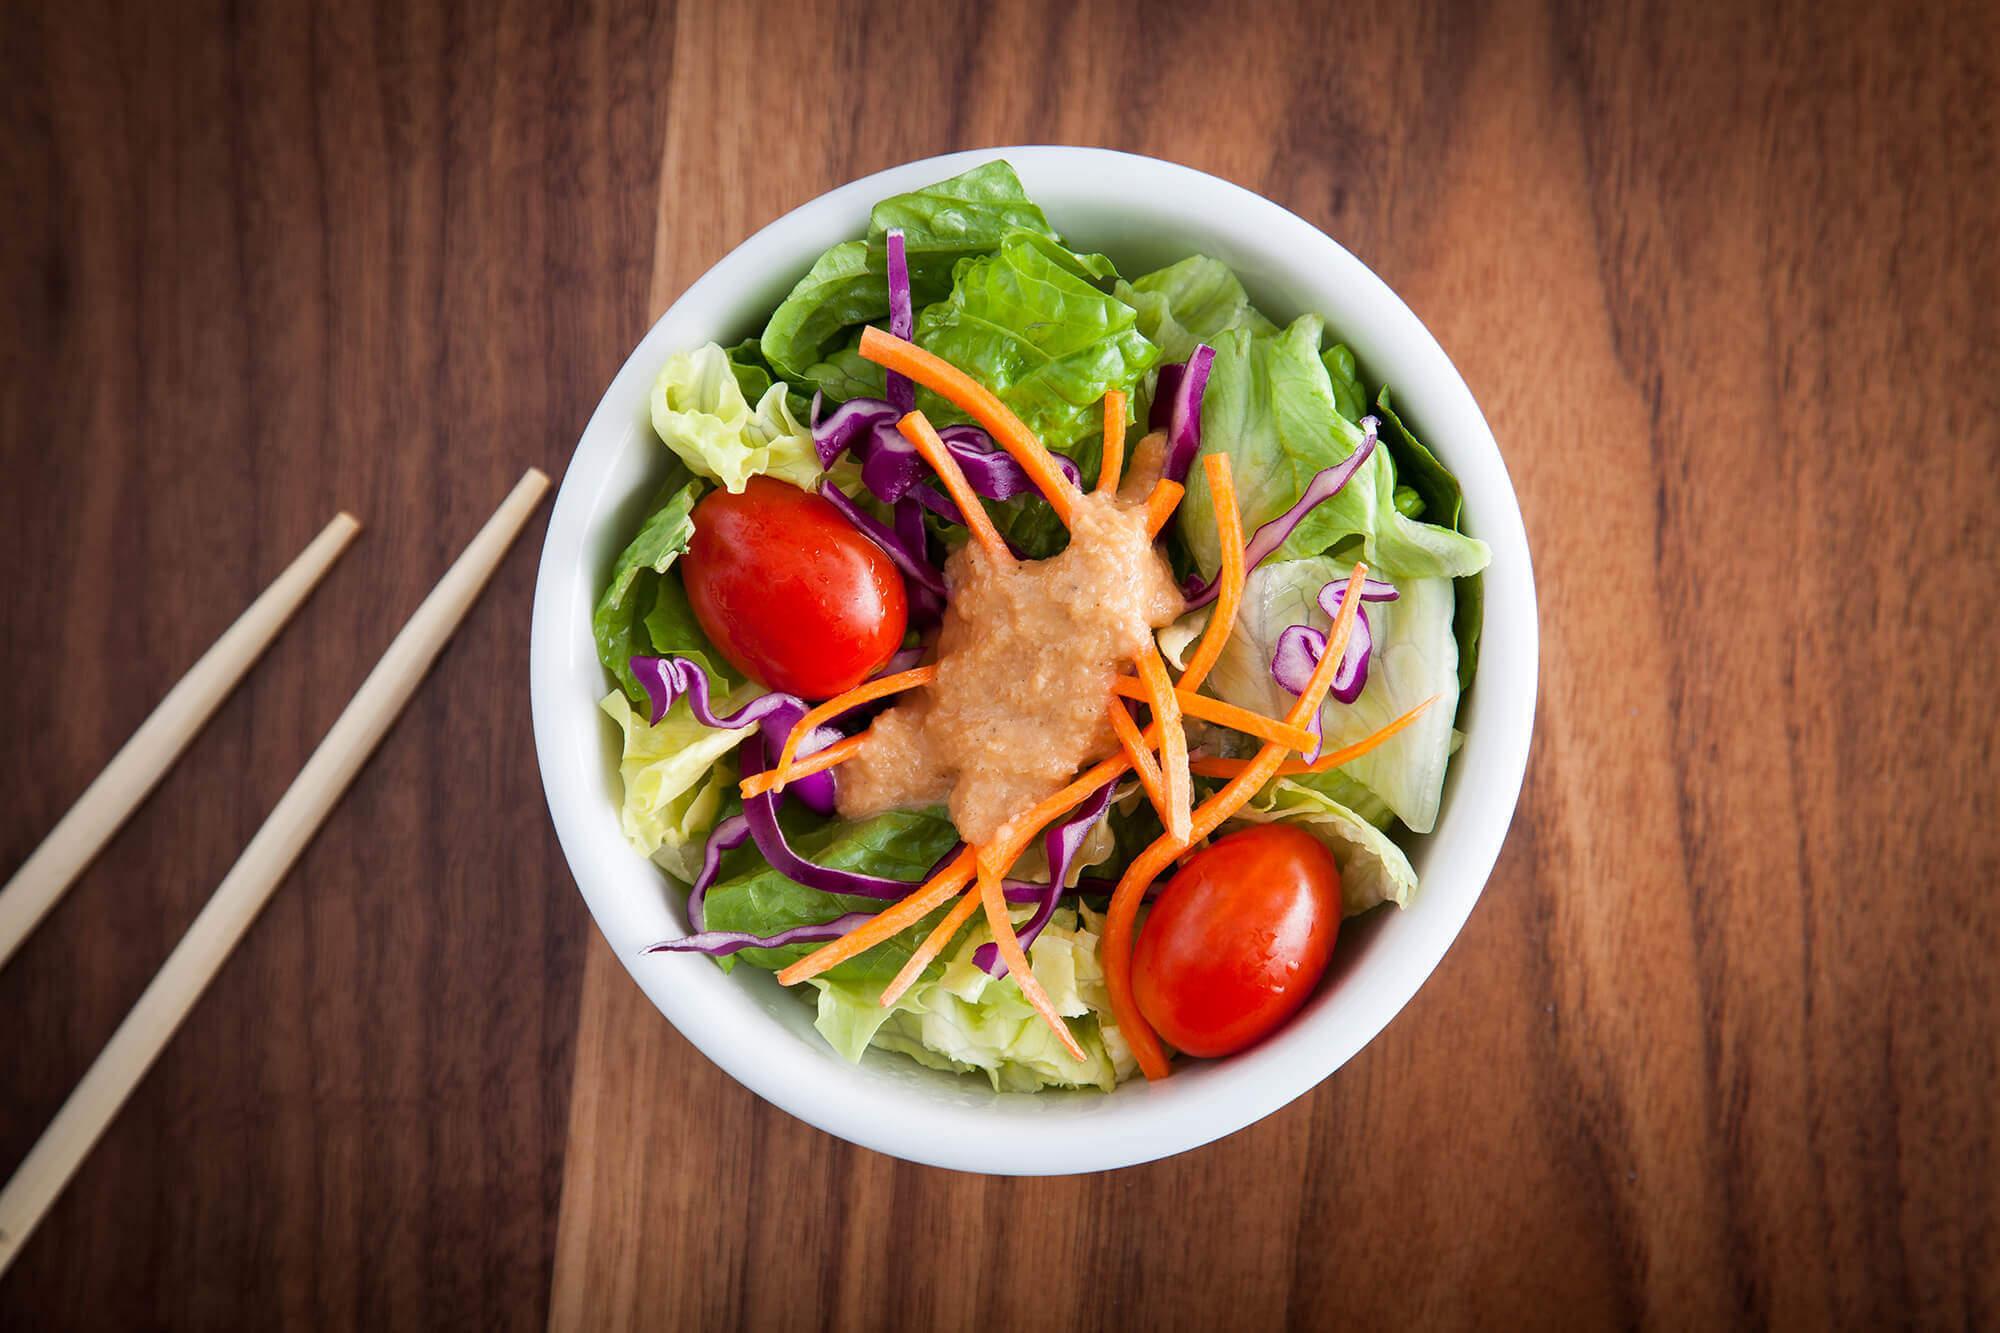 Samurai Salad